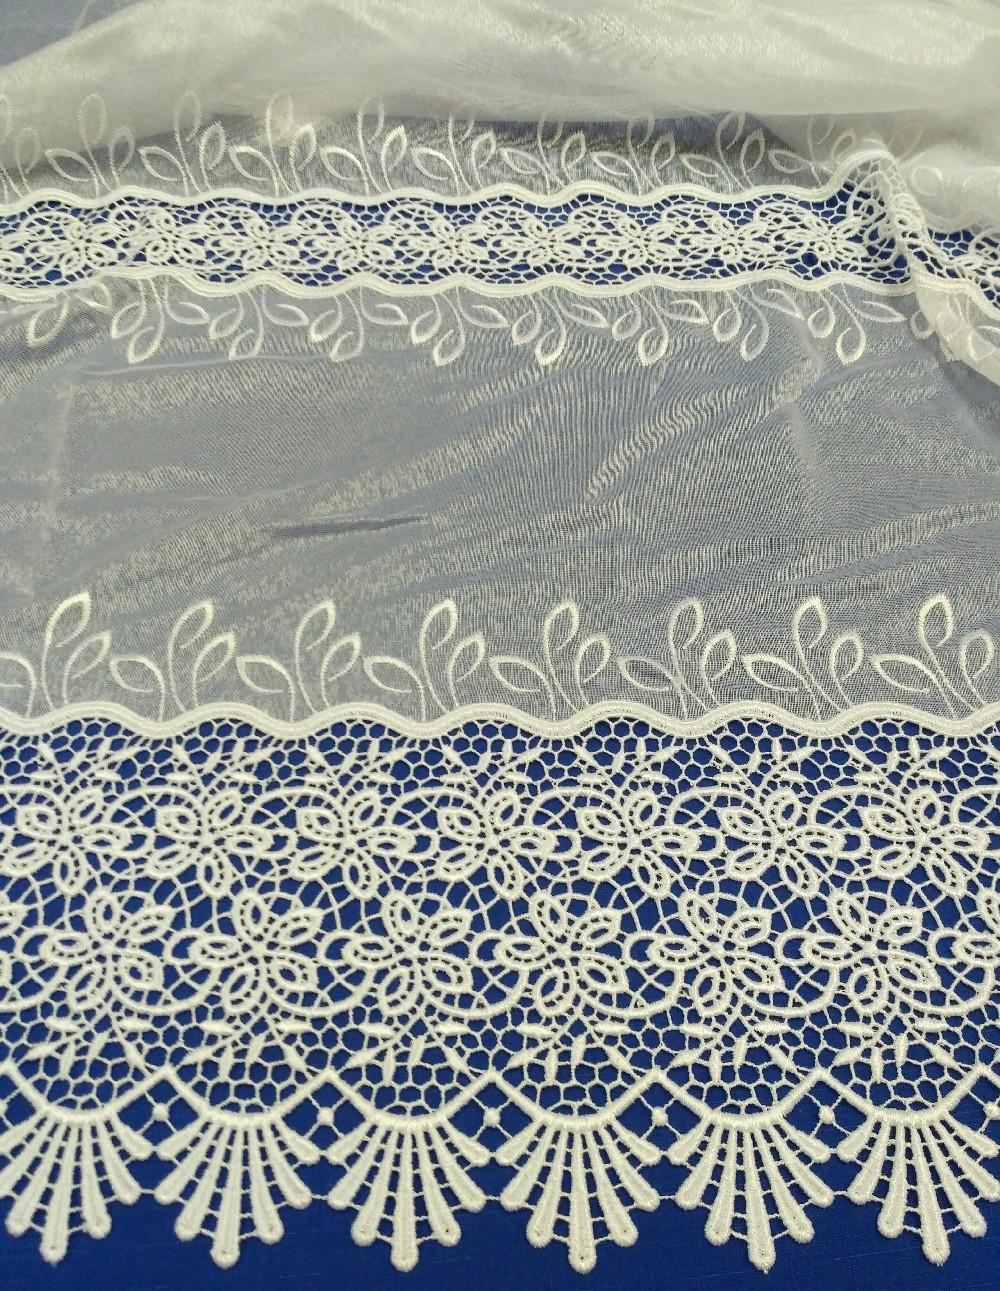 záclona G 11160/180/0001